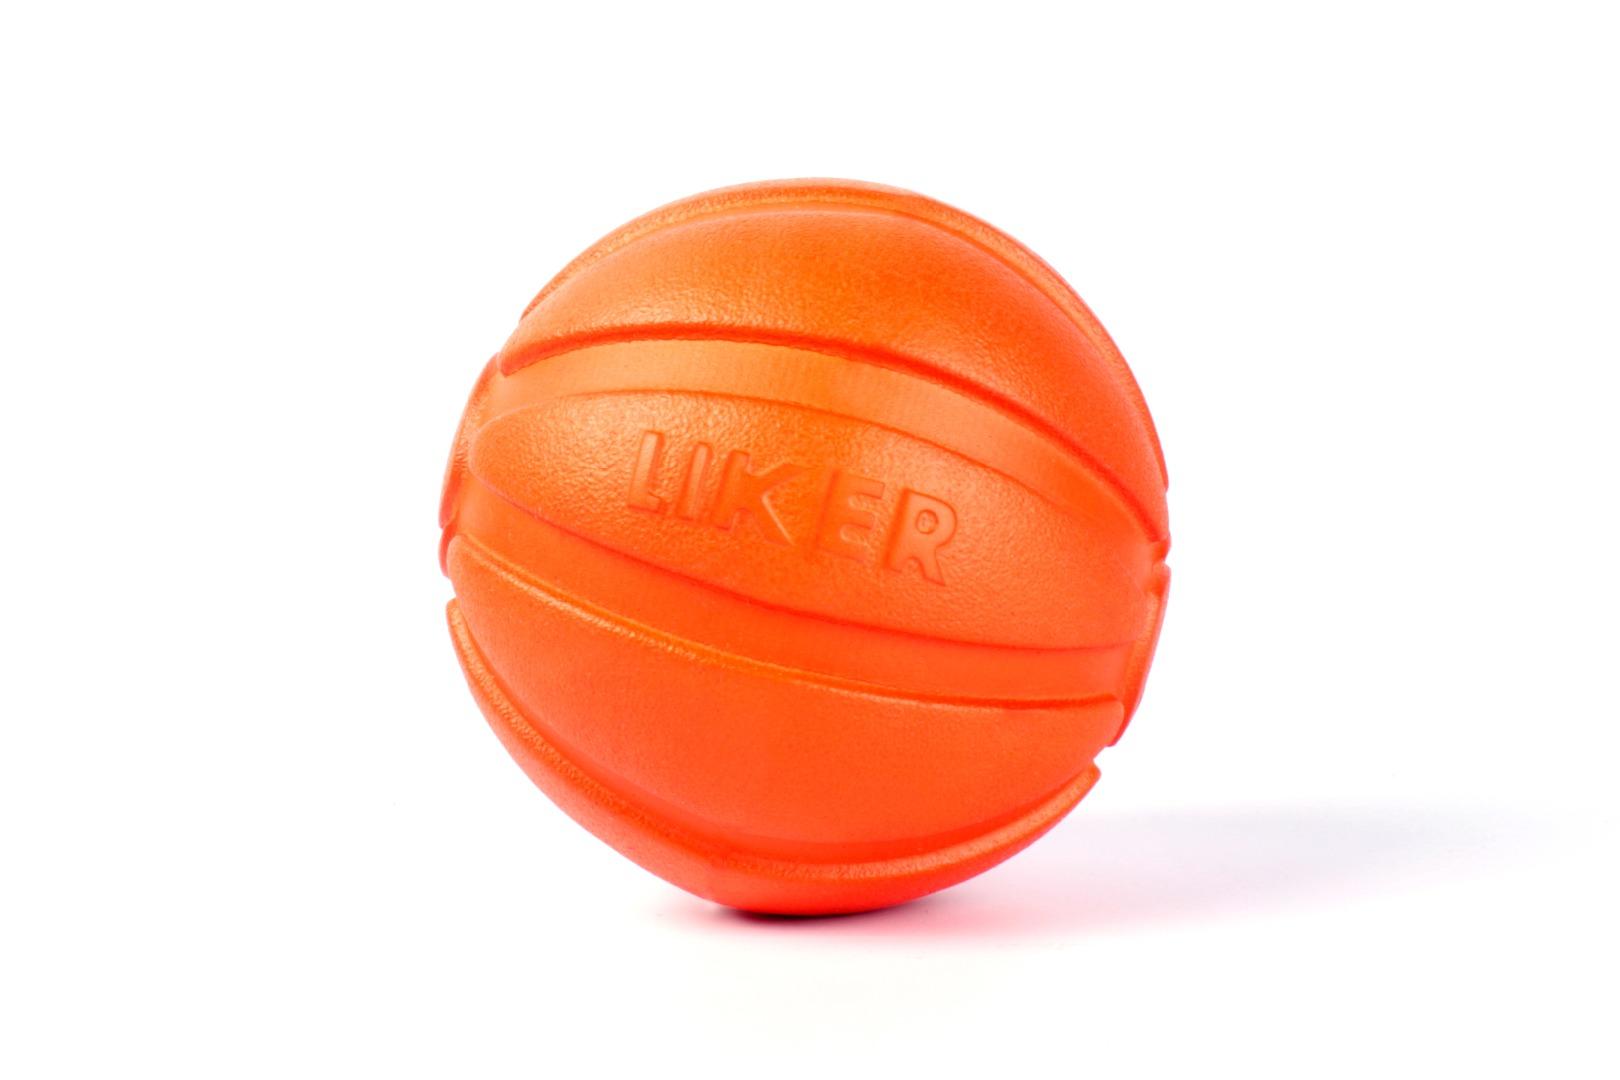 liker 6294 Liker мяч для собак, 7 см